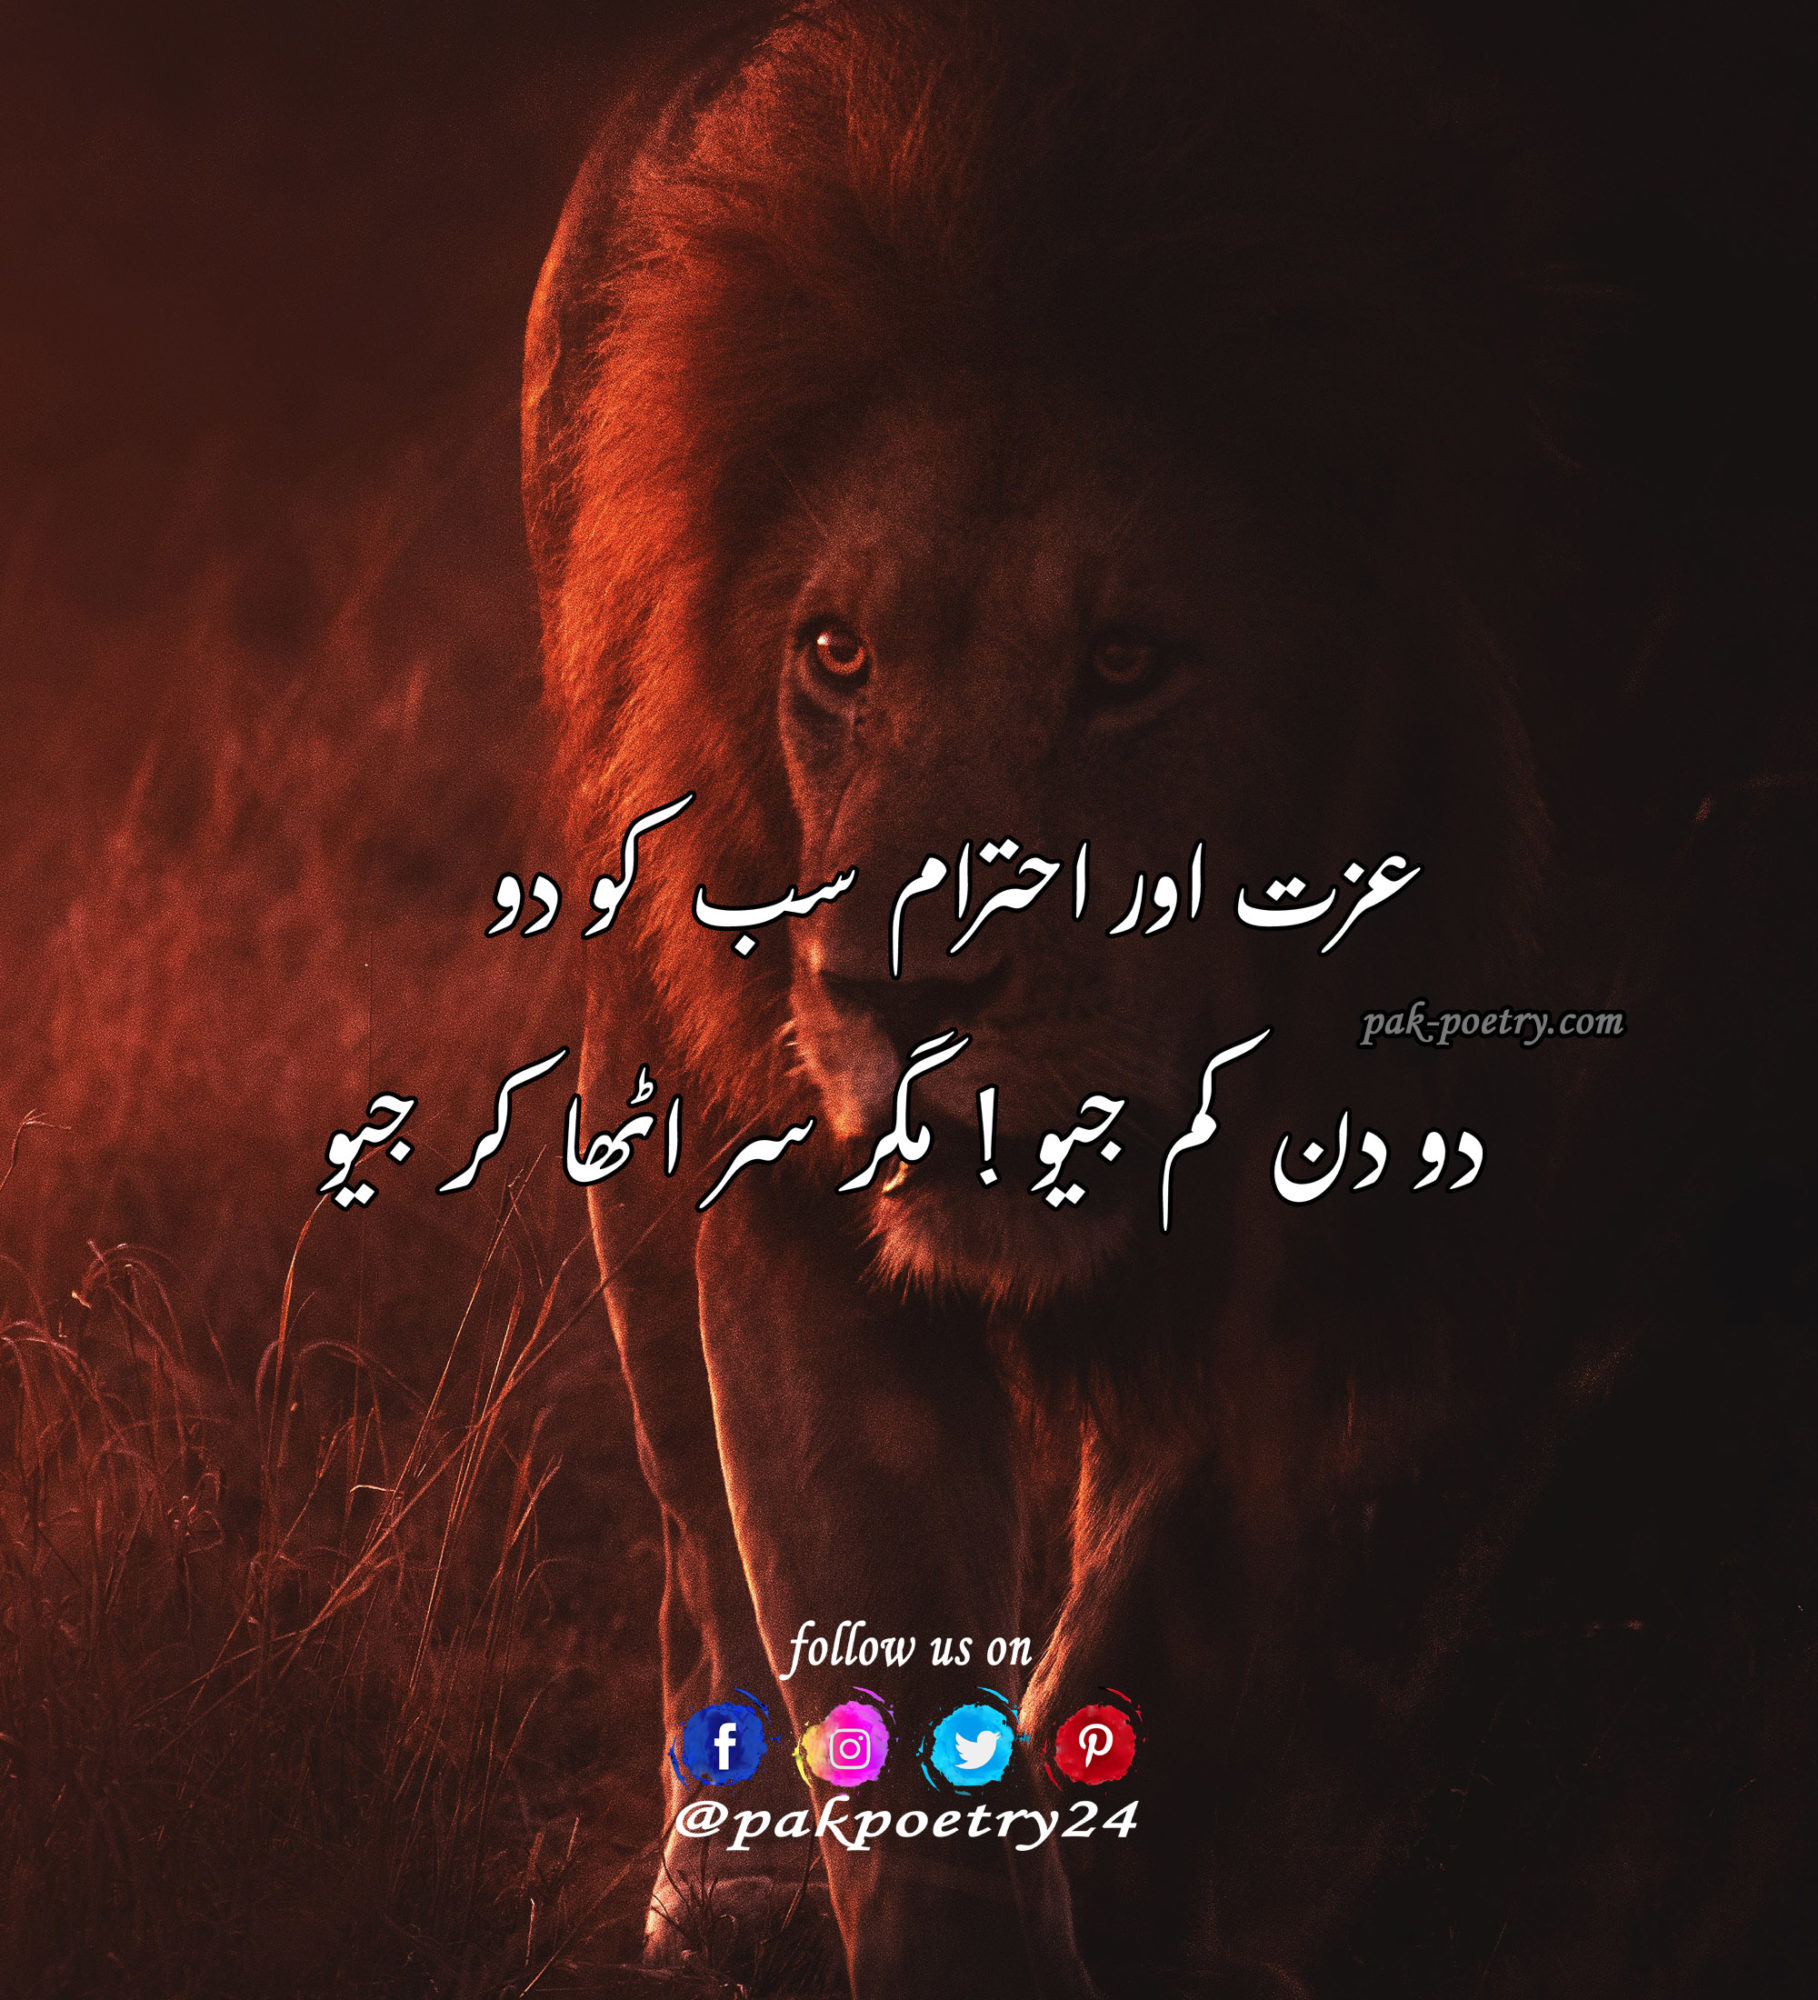 Sad poetry, sad poetry in urdu, poetry sad, sad poetry urdu, urdu sad poetry, sad poetry pics, poetry in urdu sad, Poetry in urdu, urdu poetry, poetry urdu, reality poetry, reality poetry in urdu, reality poetry urdu, attitude poetry,